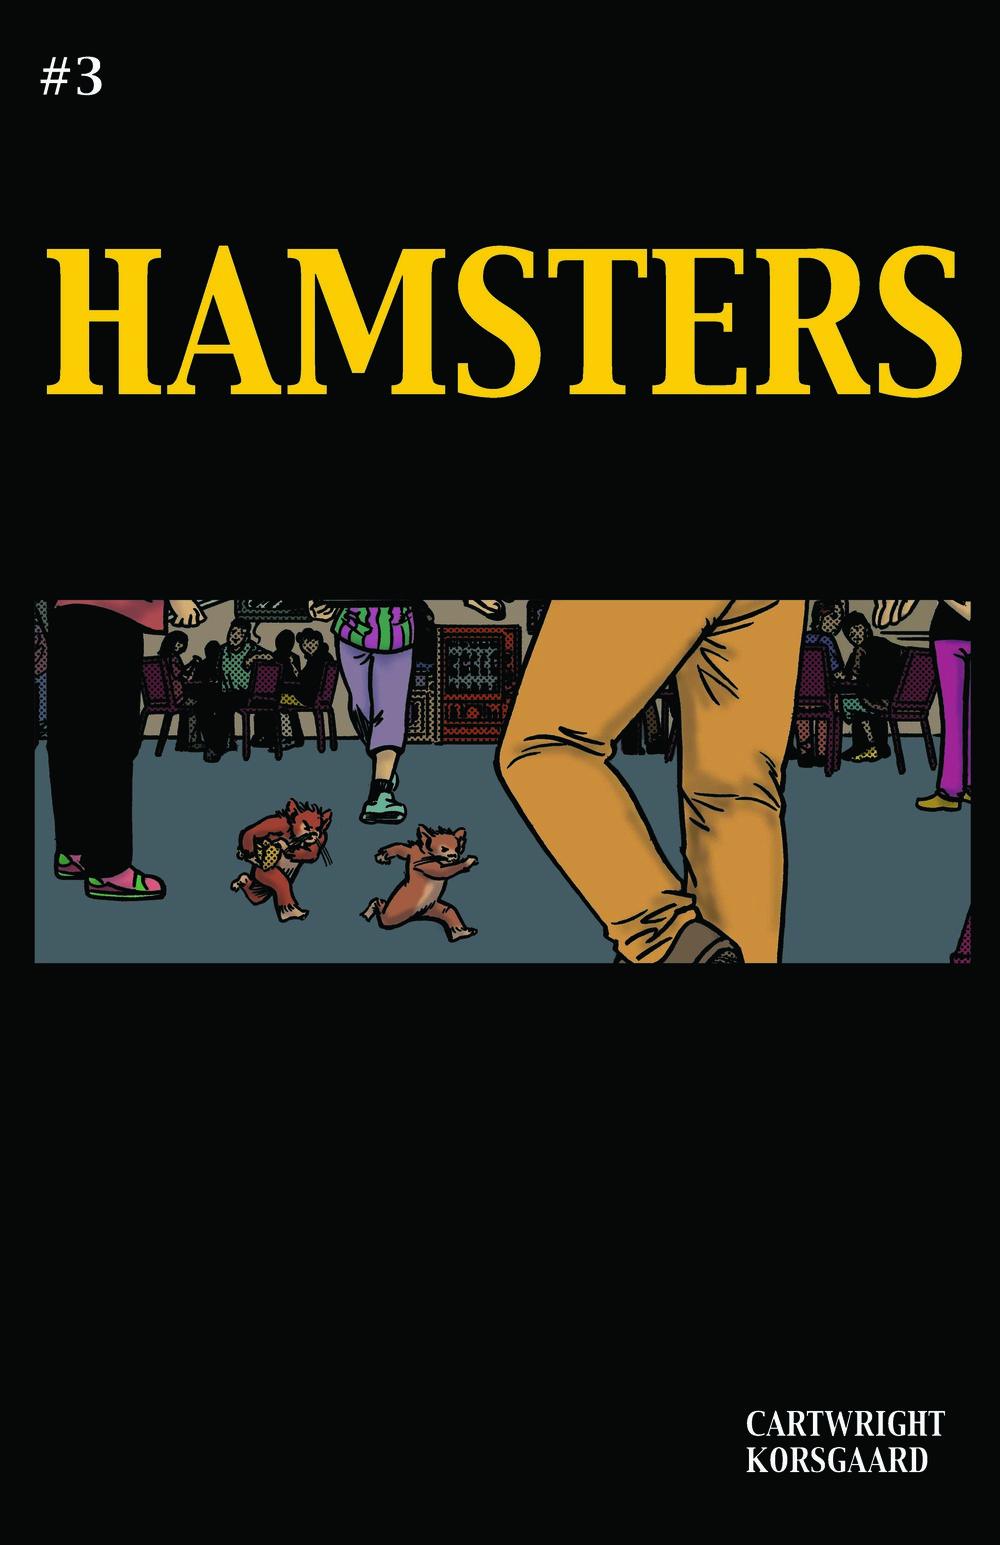 HamstersIssue3